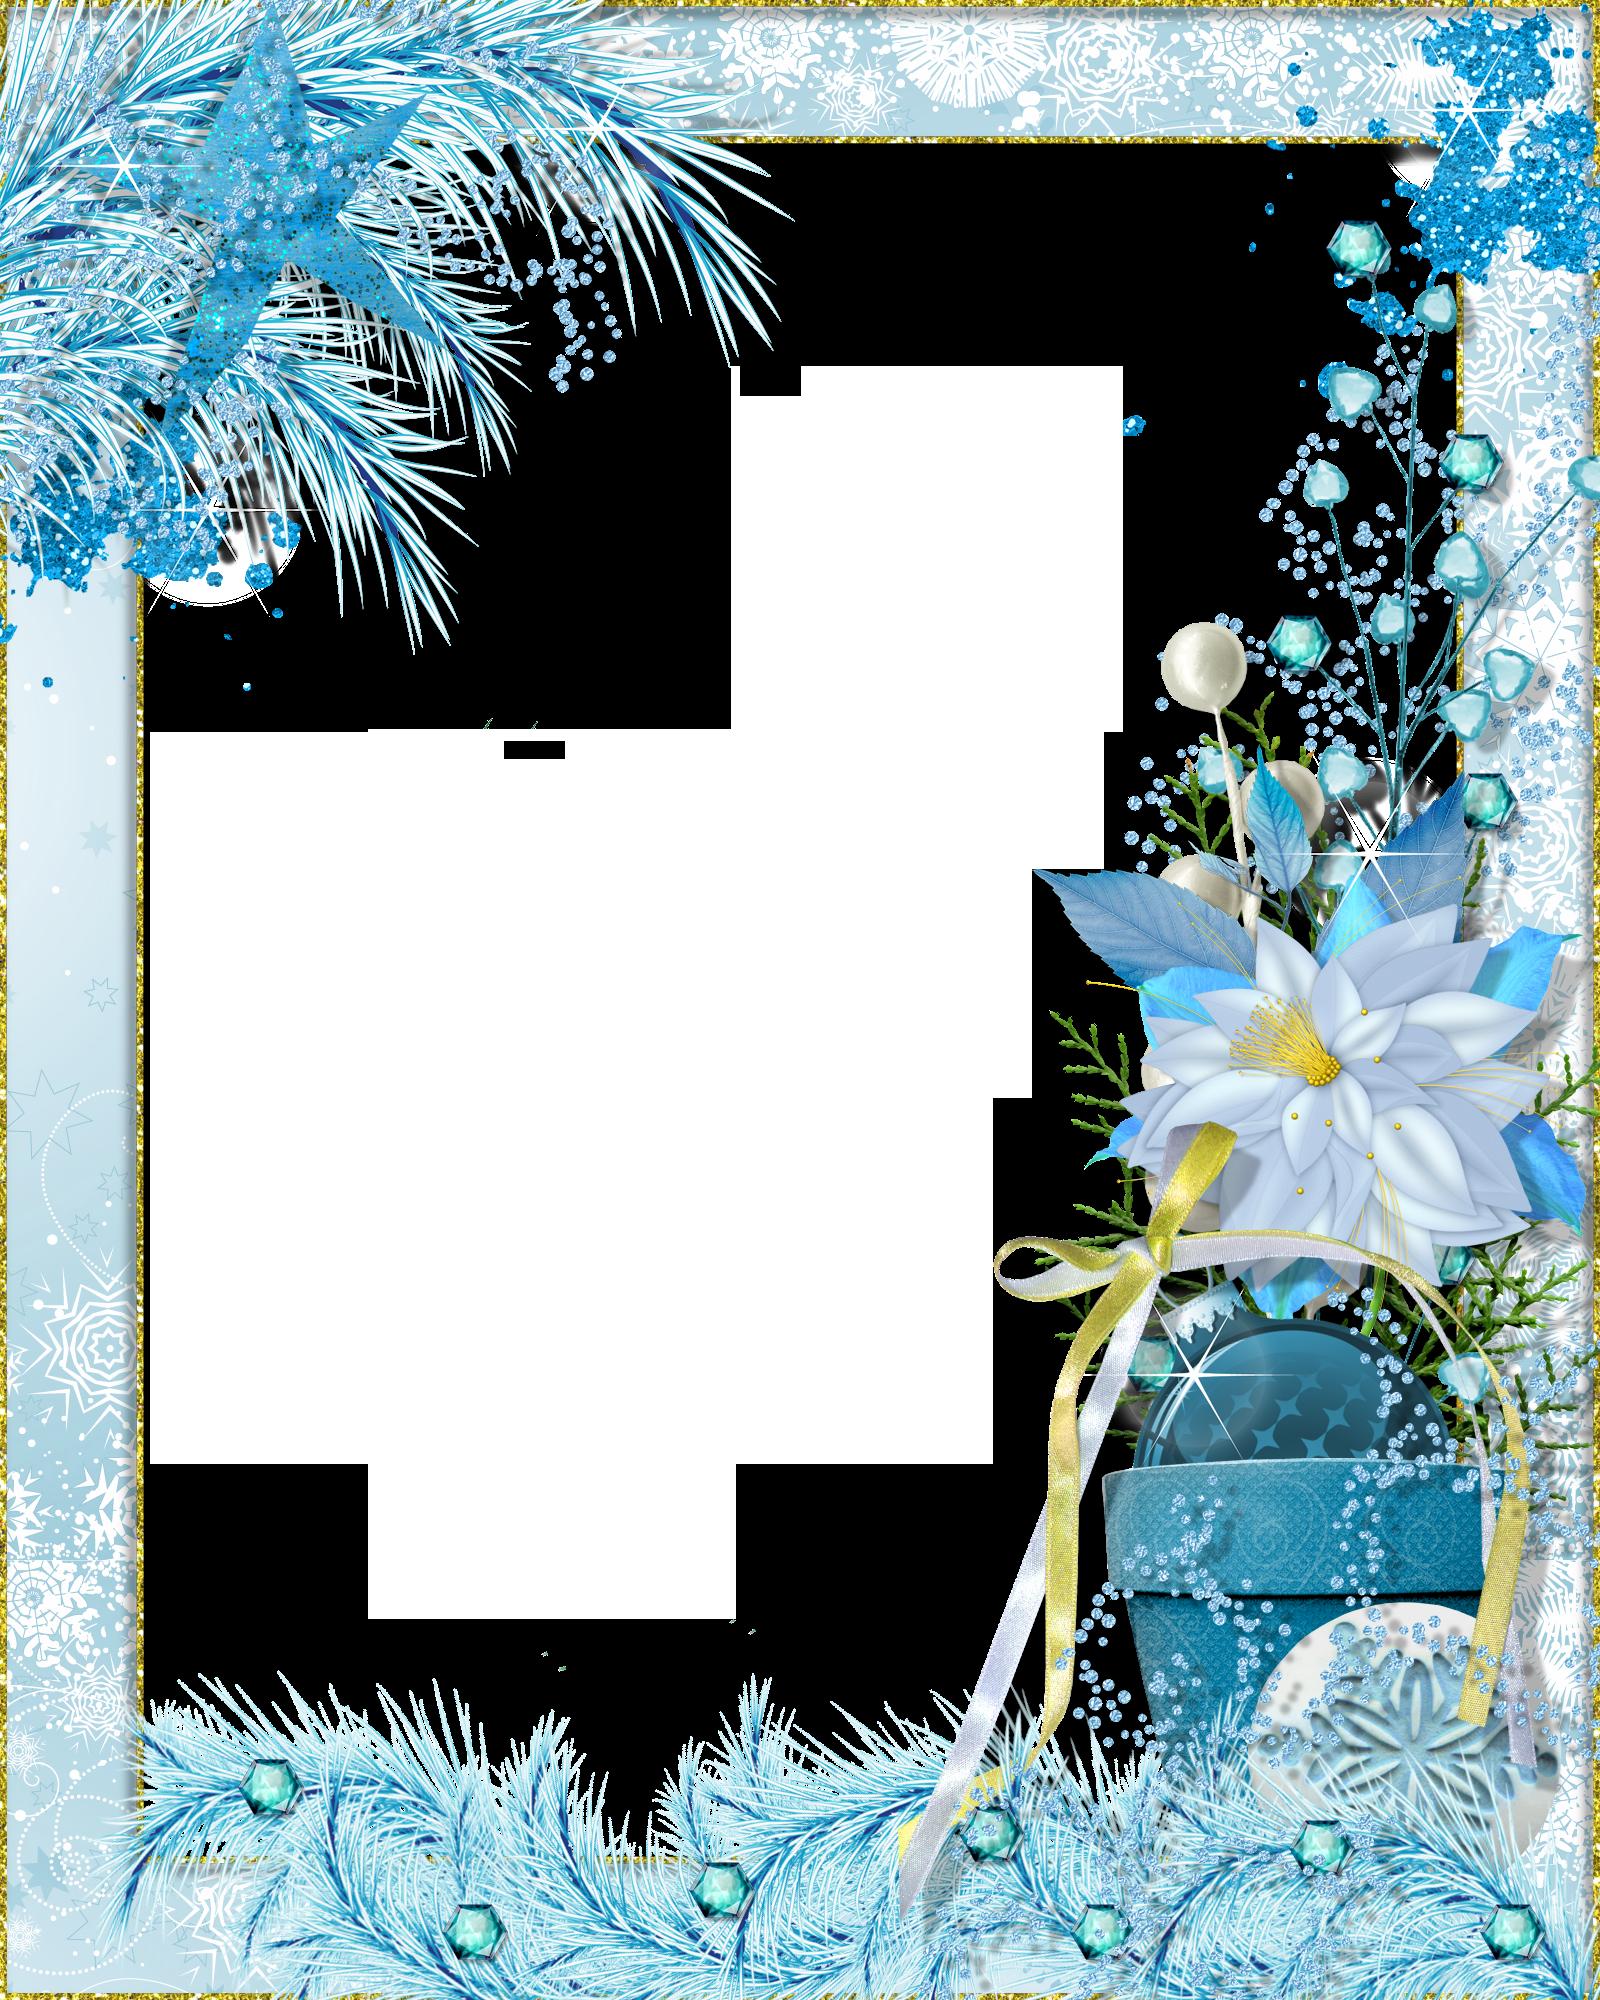 Transparent Png Photo Frame Winter Fantasy Okraje Papier